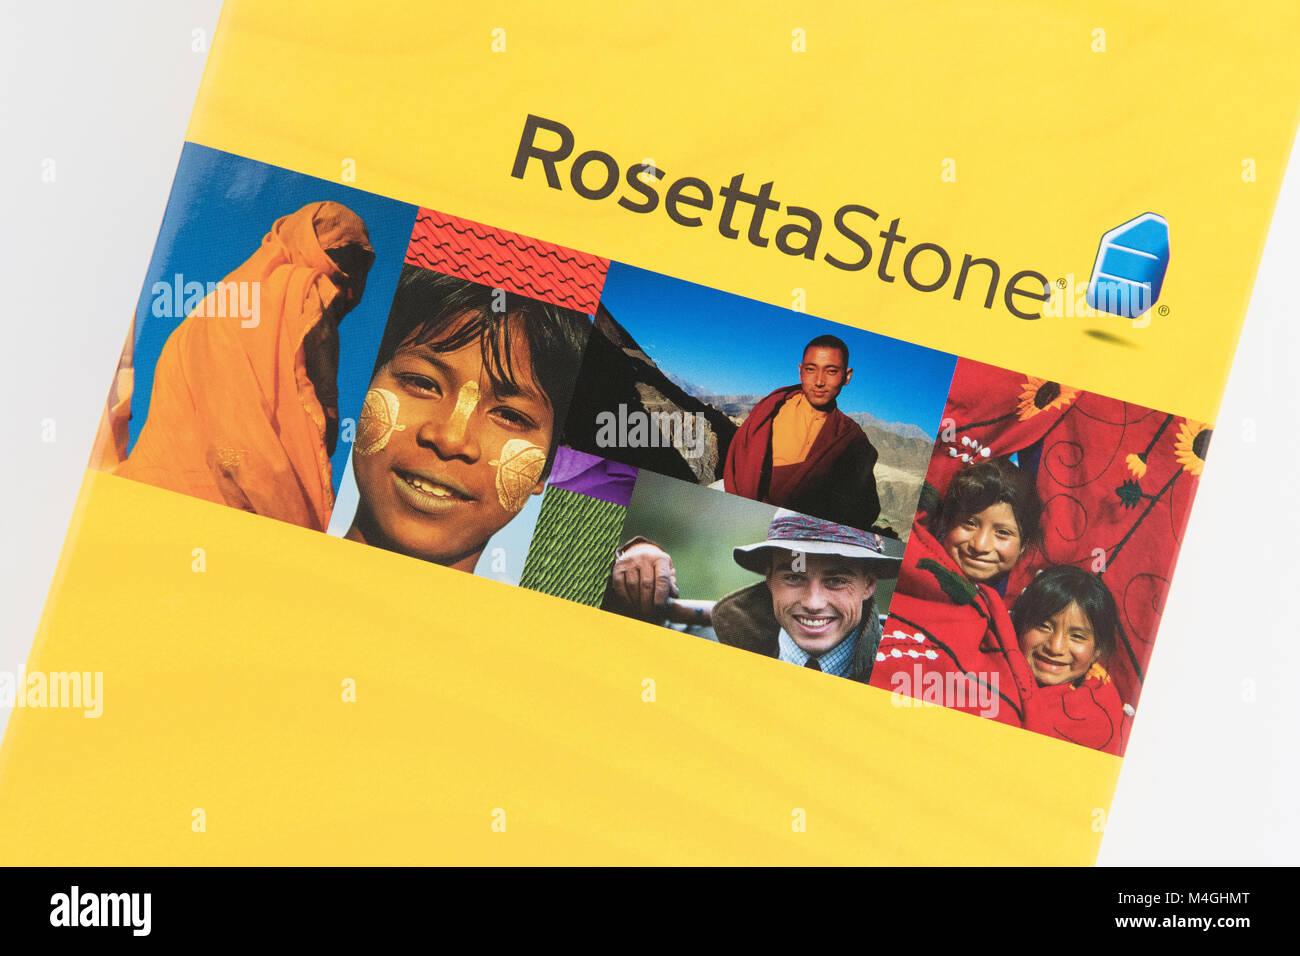 Rosetta Stone Language Learning Software Stockbild